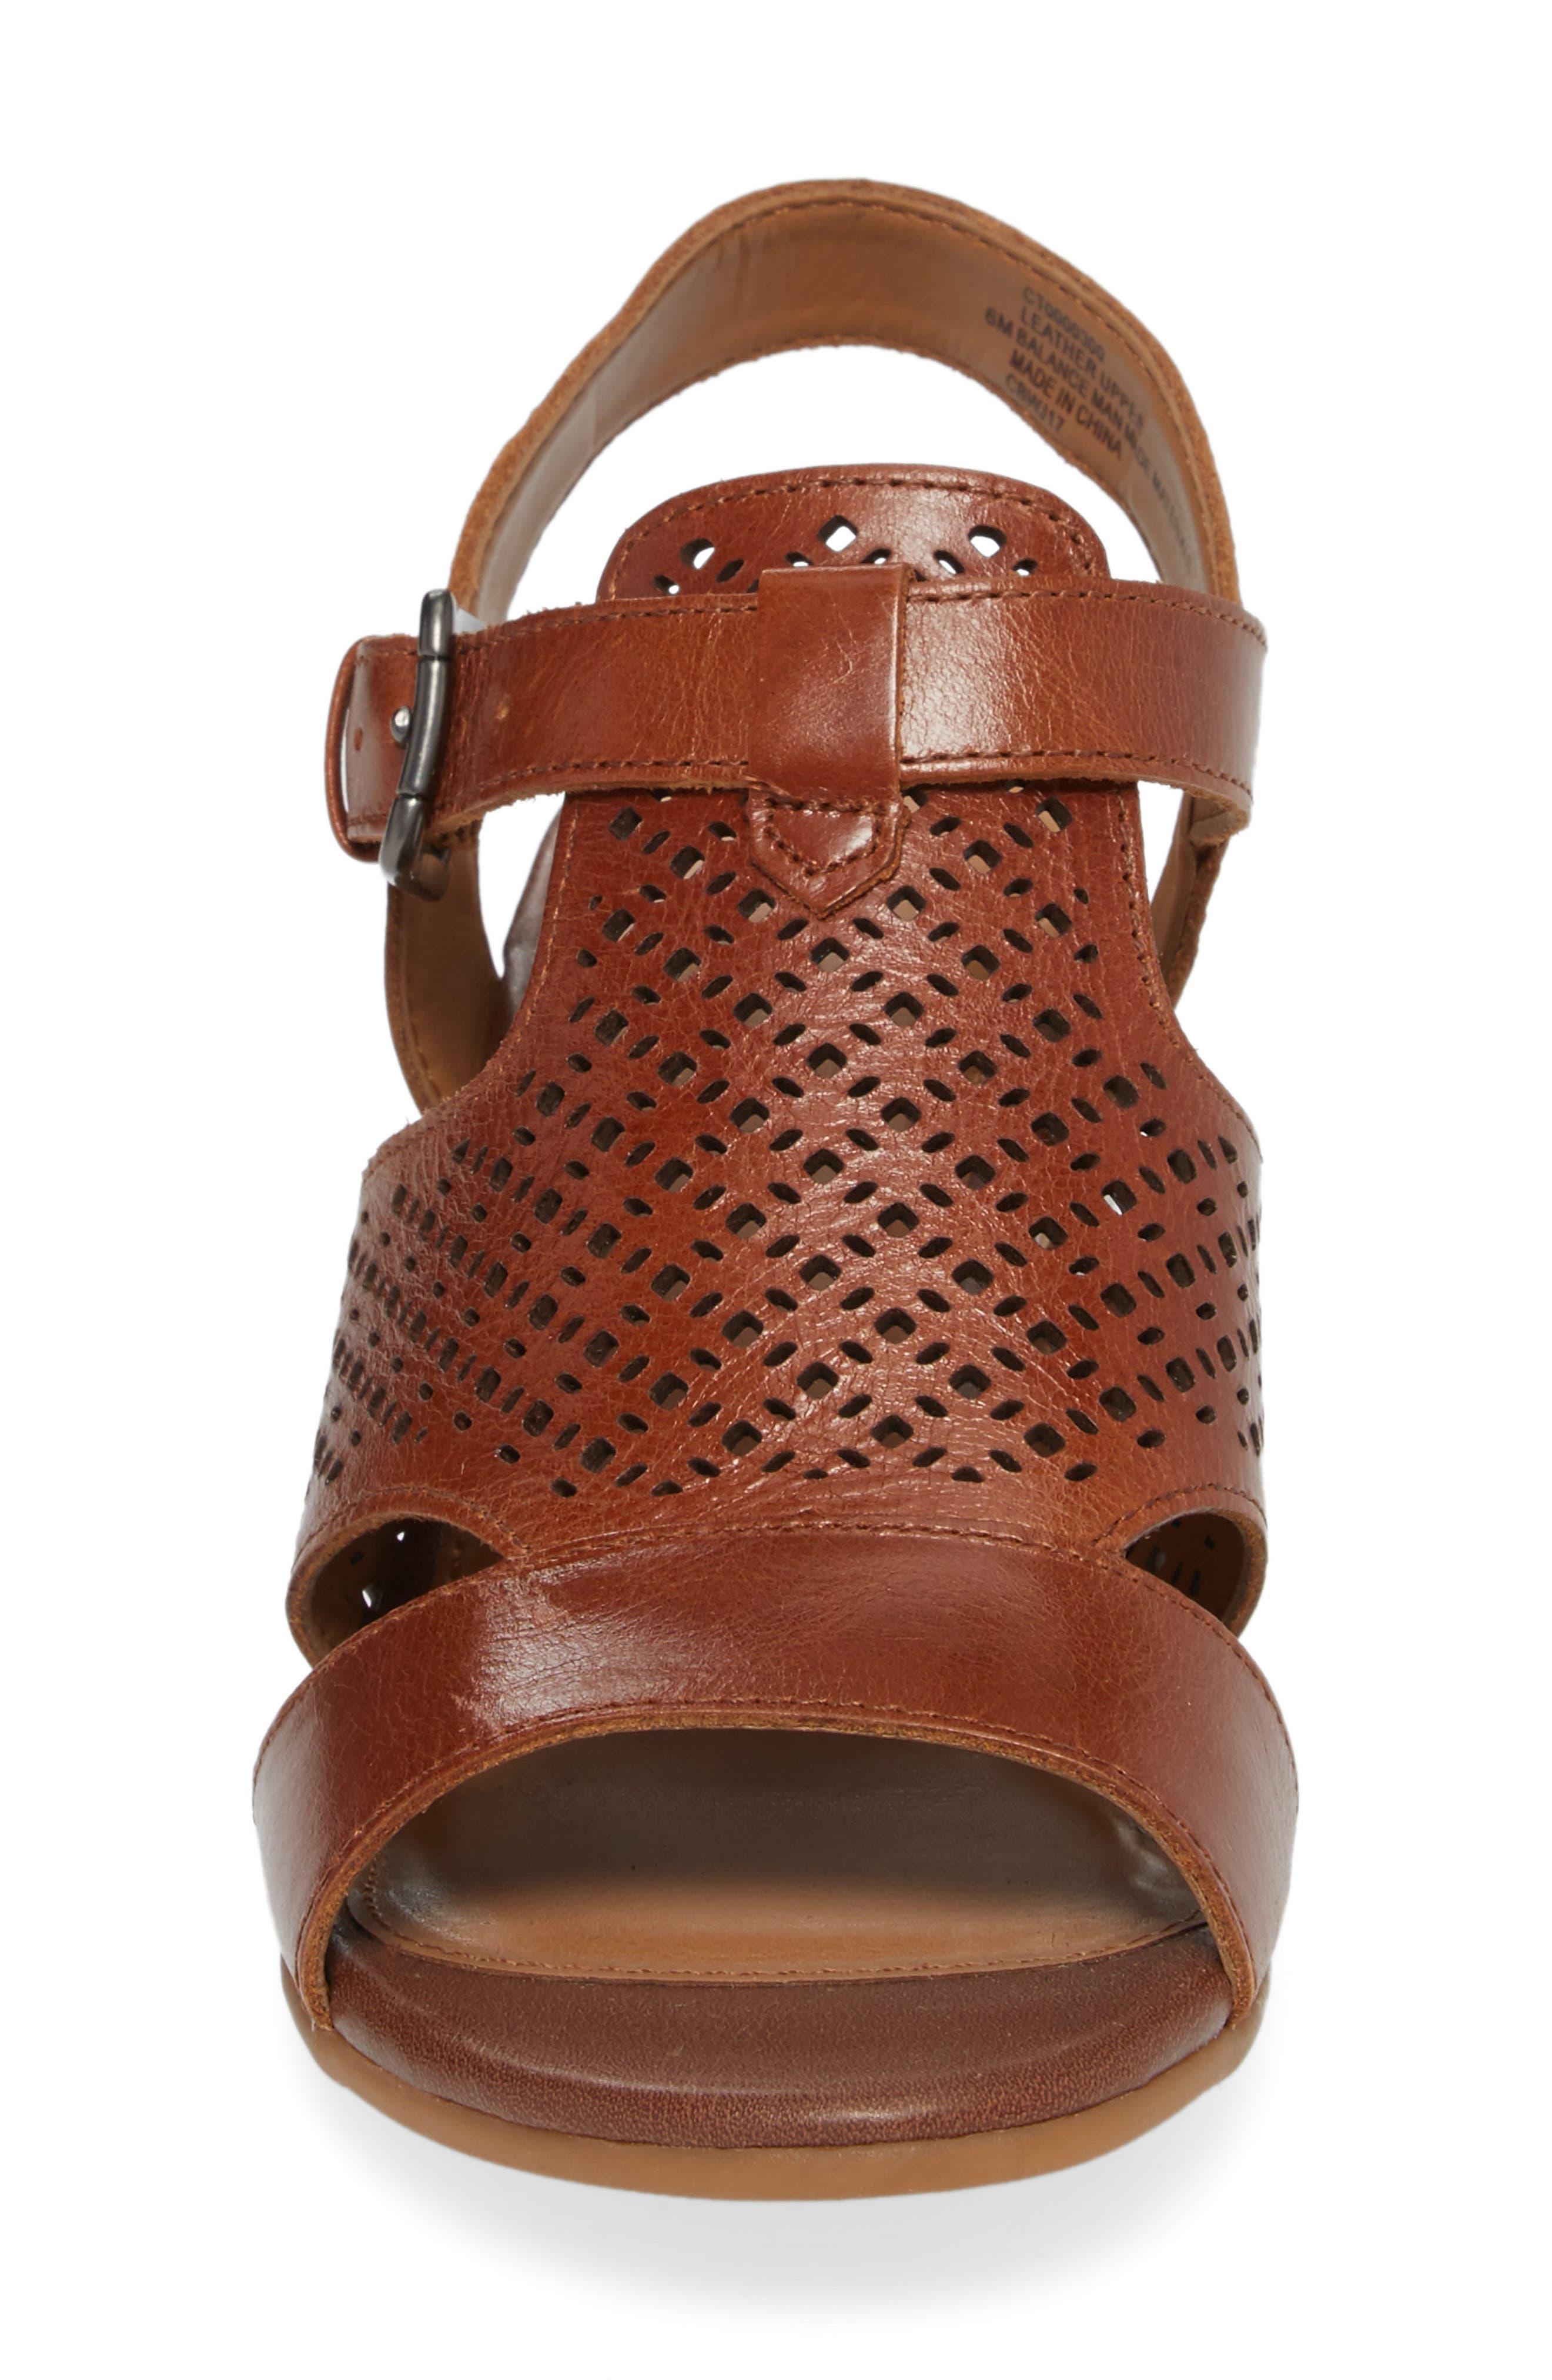 Amber Perforated Block Heel Sandal,                             Alternate thumbnail 4, color,                             Luggage Leather